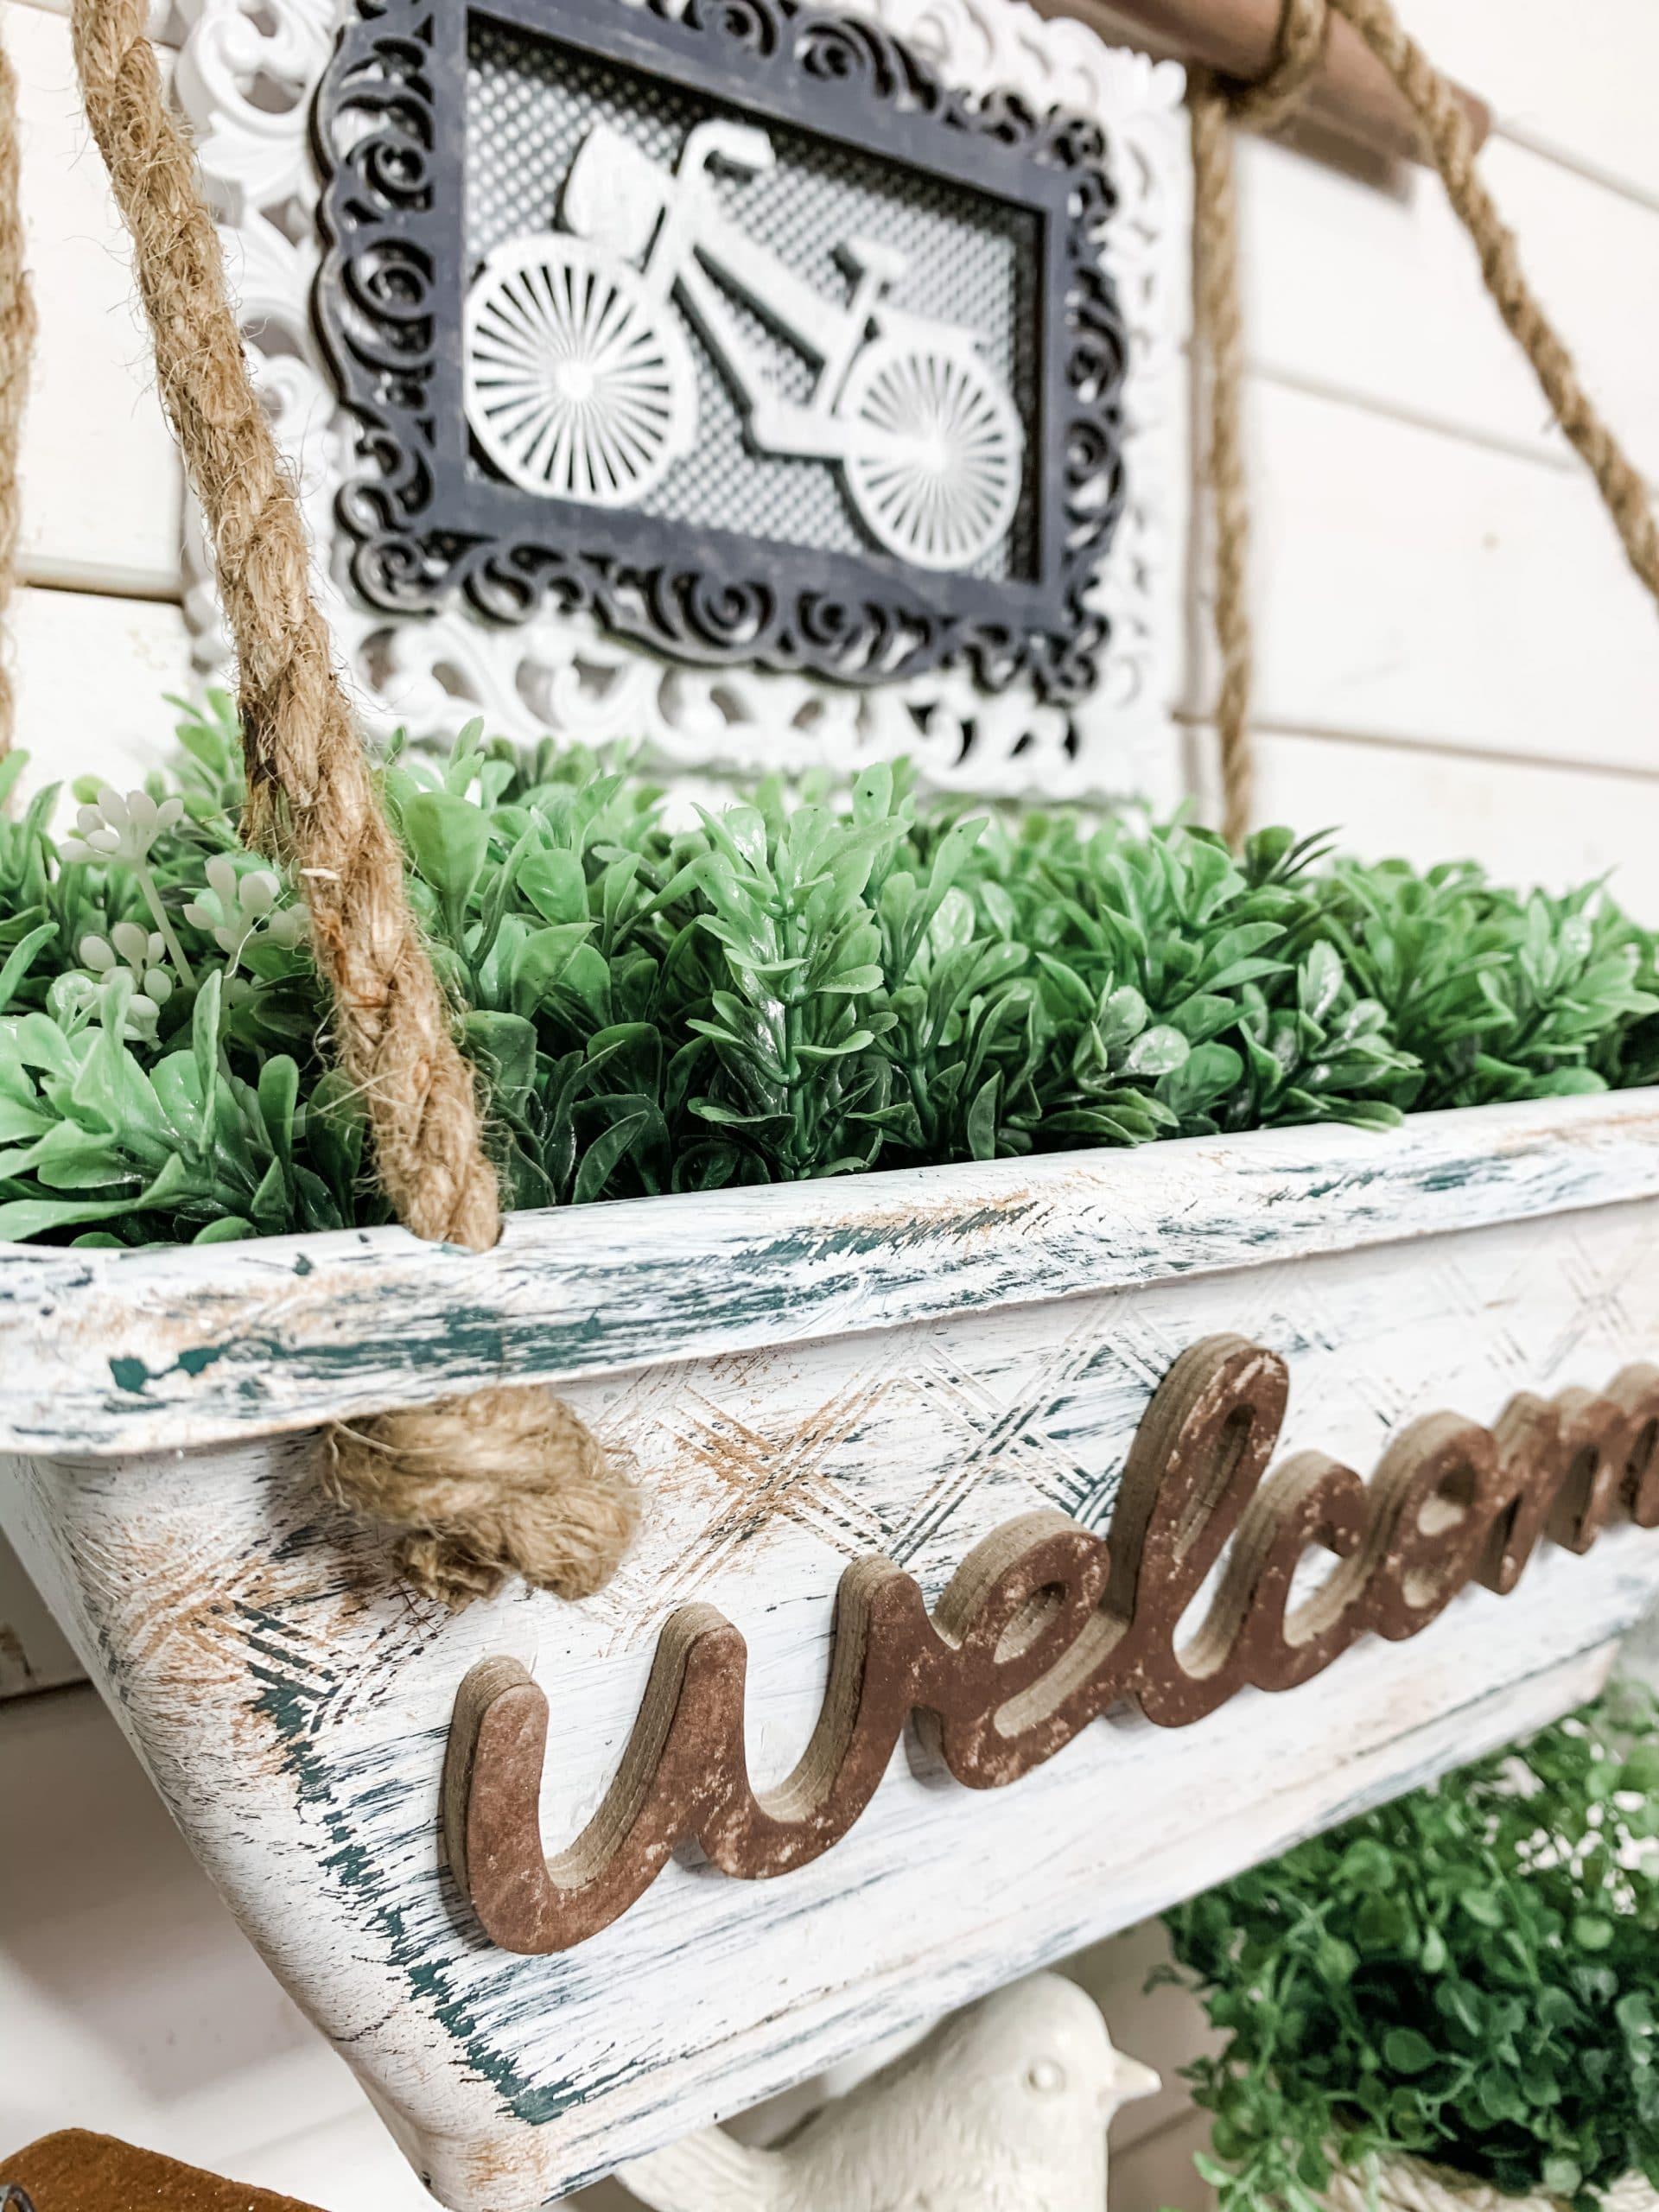 DIY Farmhouse Hanging Planter